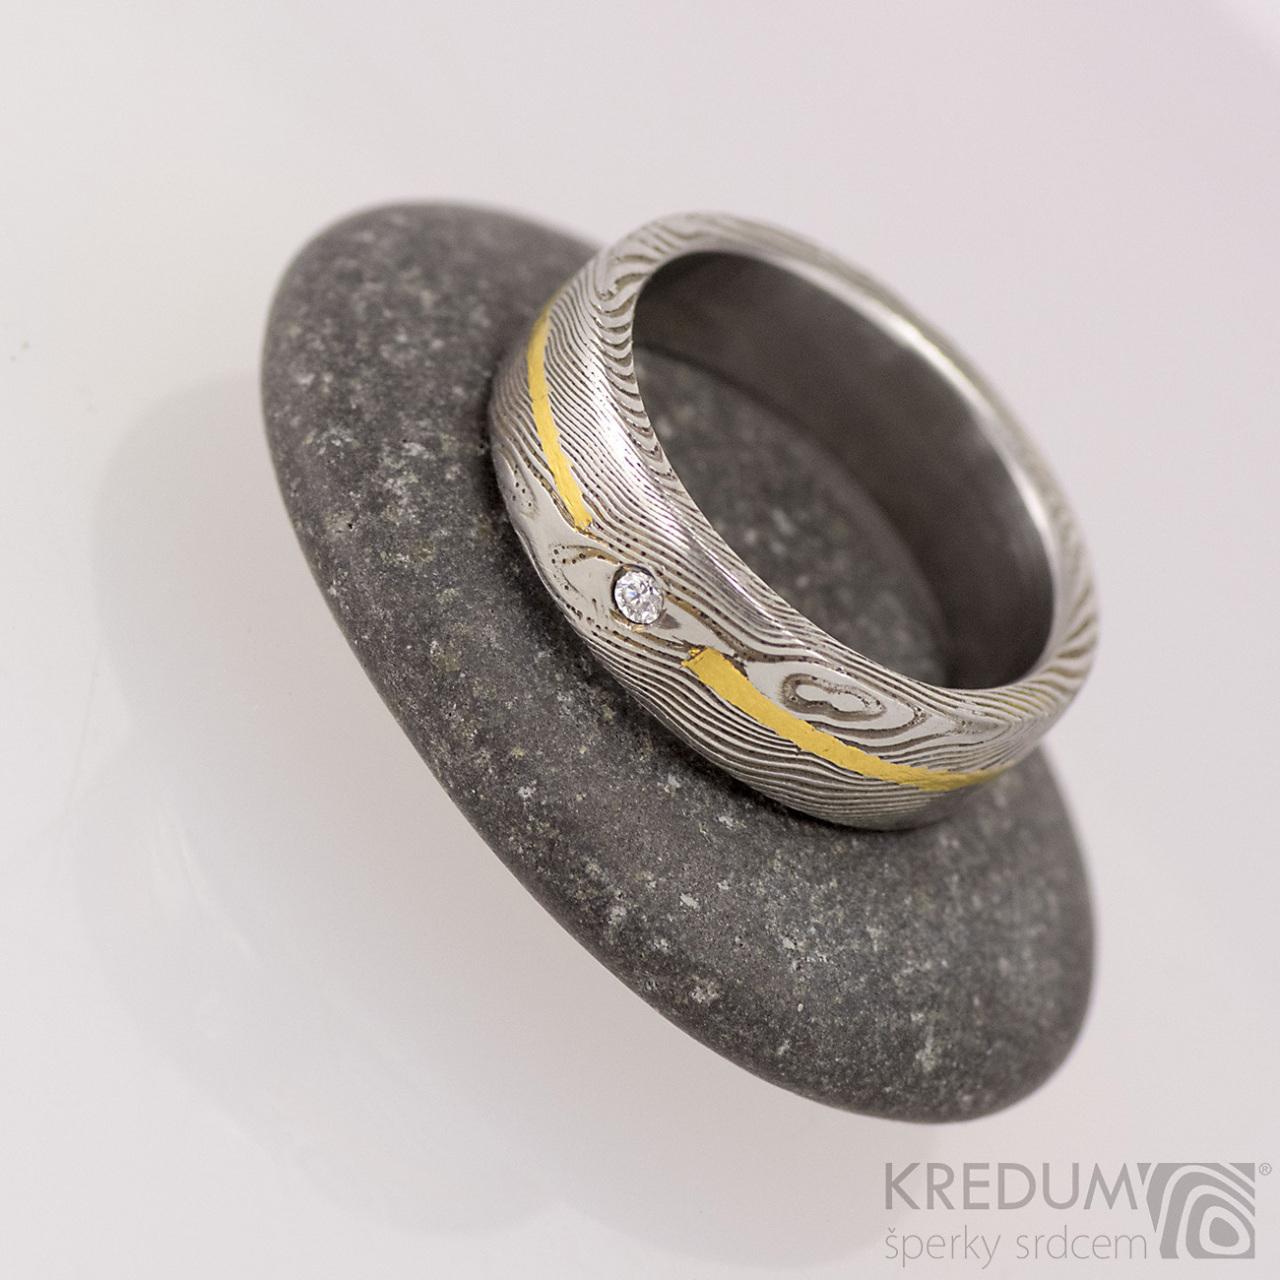 Snubni Prsten Damasteel Zlato Diamant 1 7 Mm Goda Zbozi Prodejce